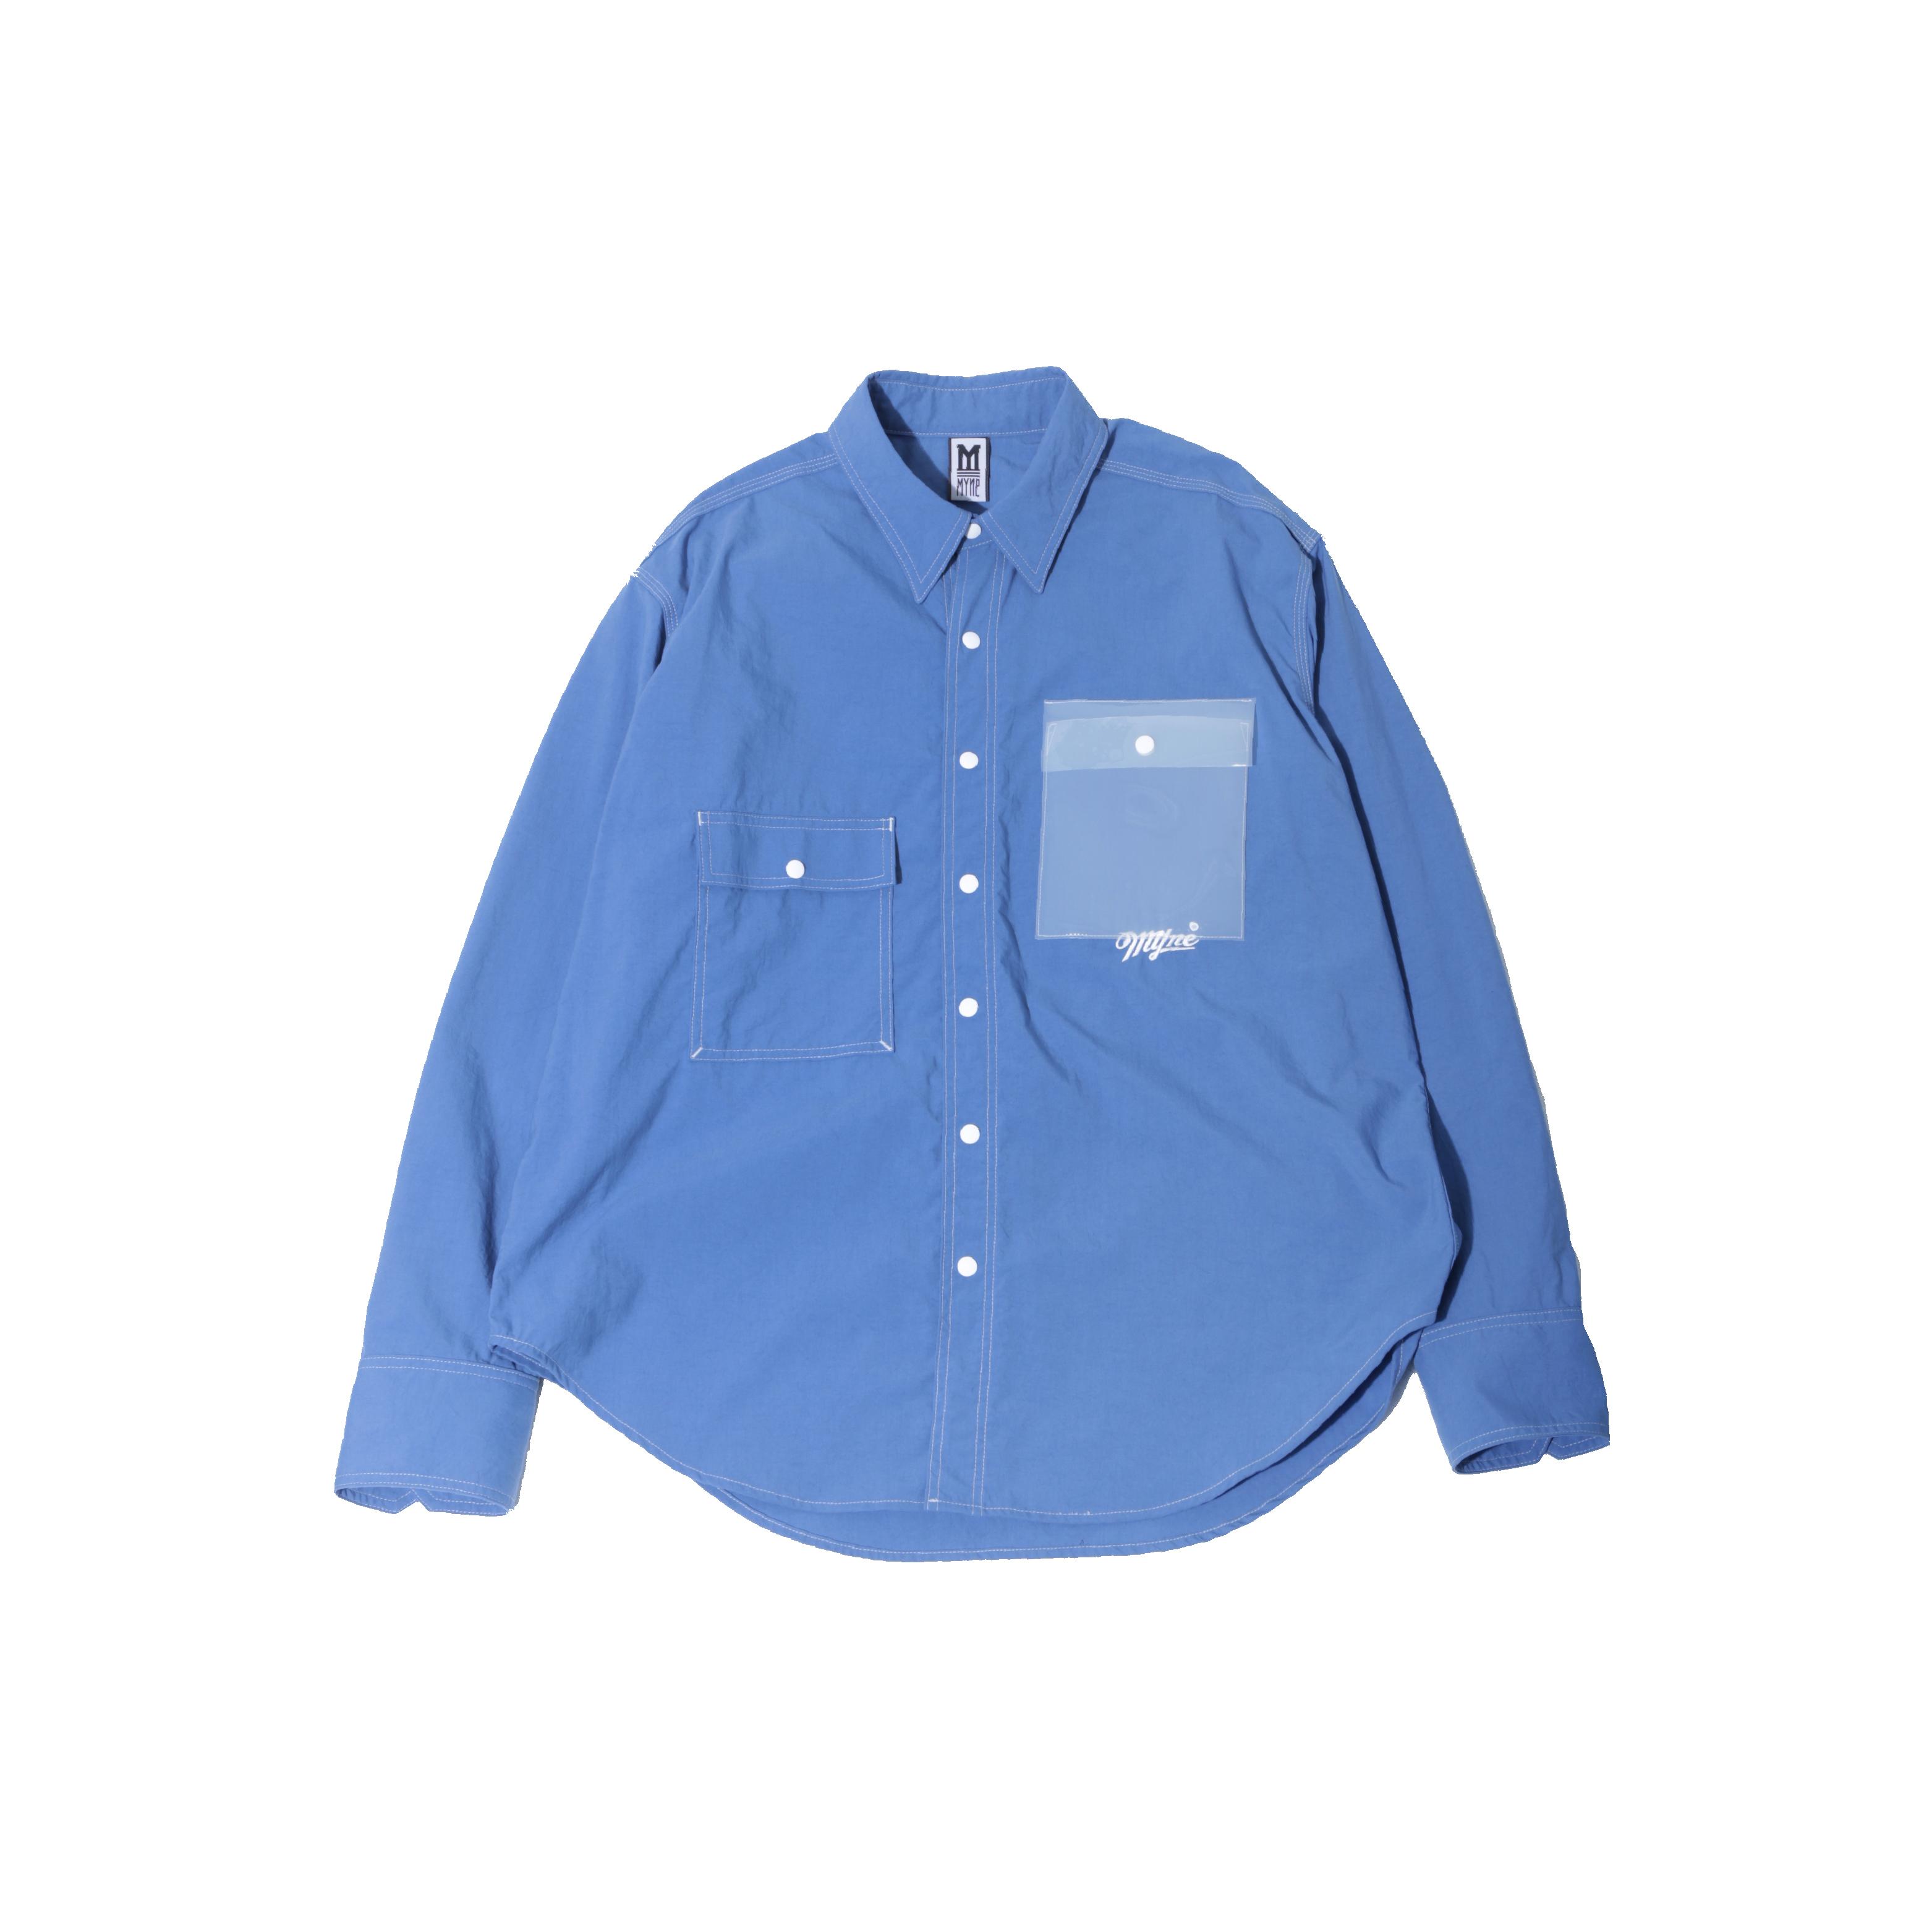 CLEAR POCKET SHIRT / BLUE - 画像1